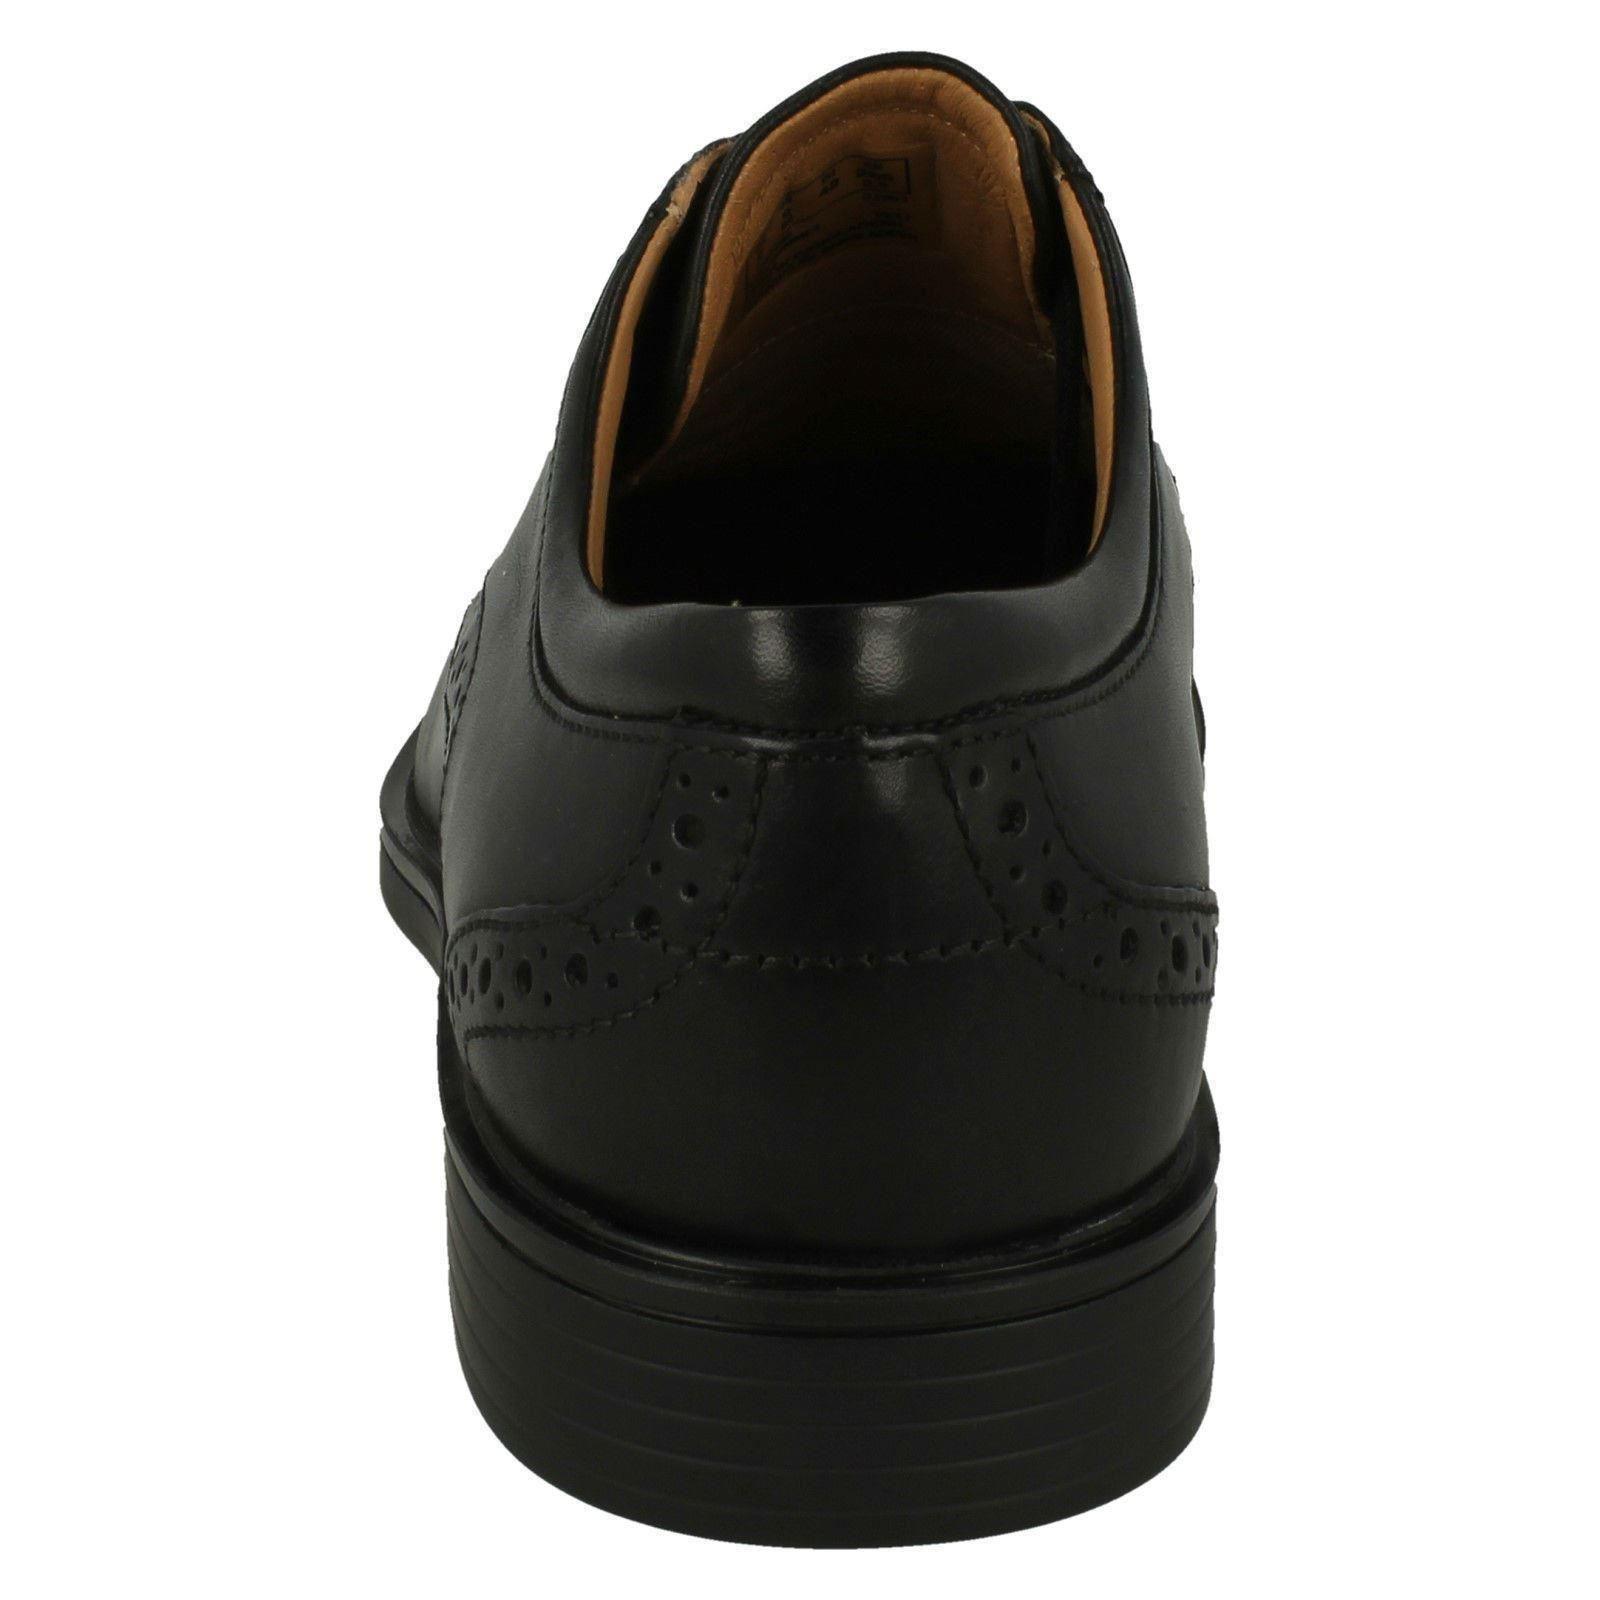 Leather di Un Clarks Men's Smart Wing Unstructured Black Aldric Brogue Shoes vPwSxUOqf